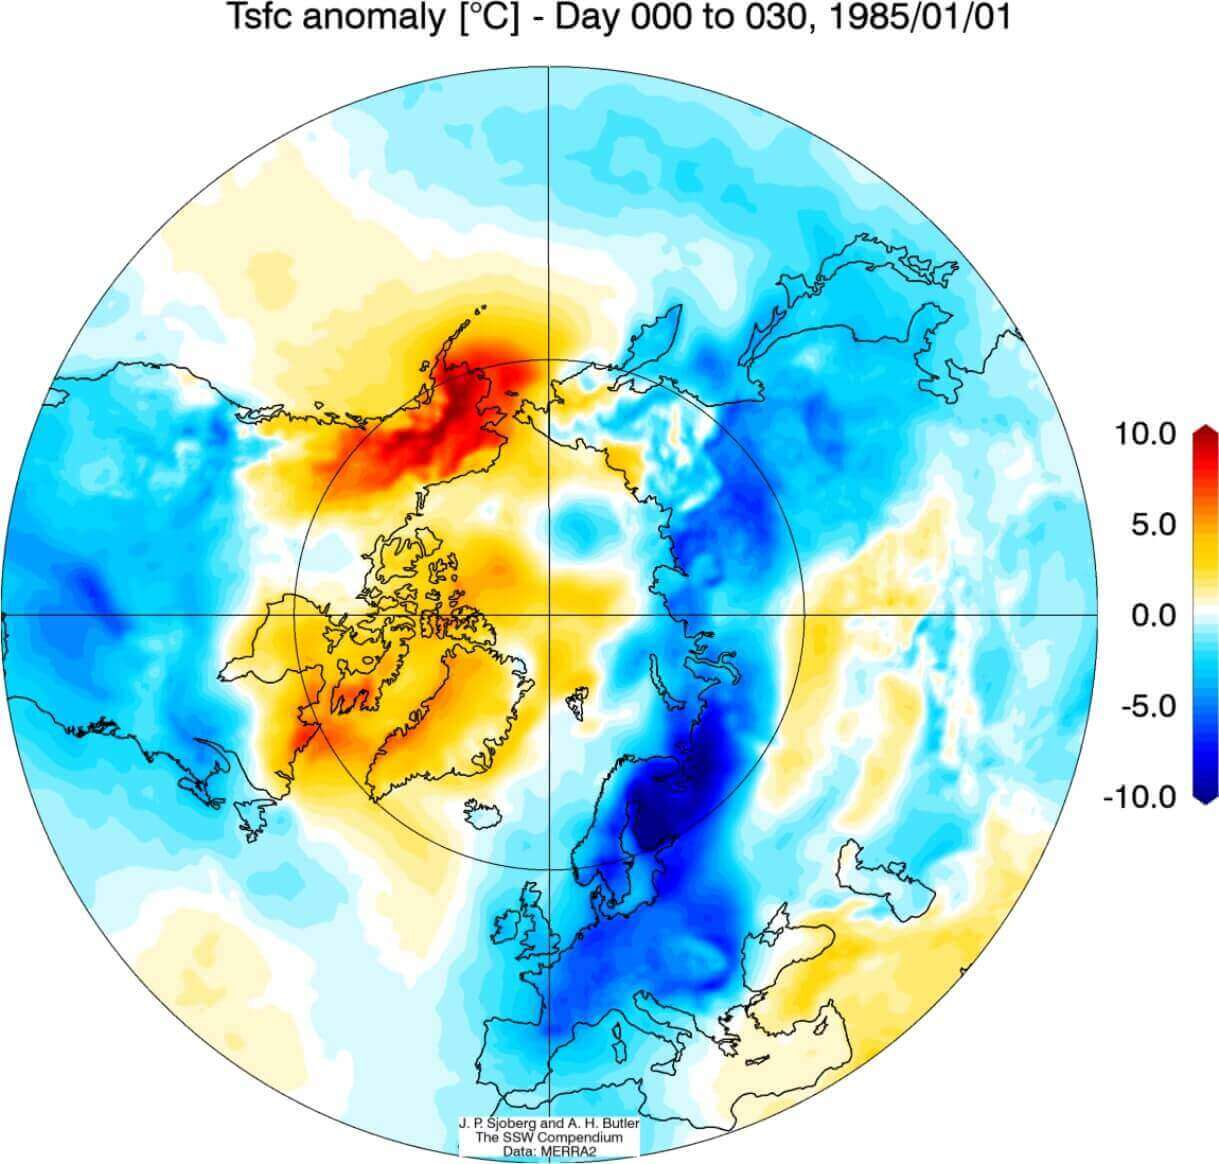 stratosphere-warming-1985-1986-weather-temperature-impact-north-hemisphere